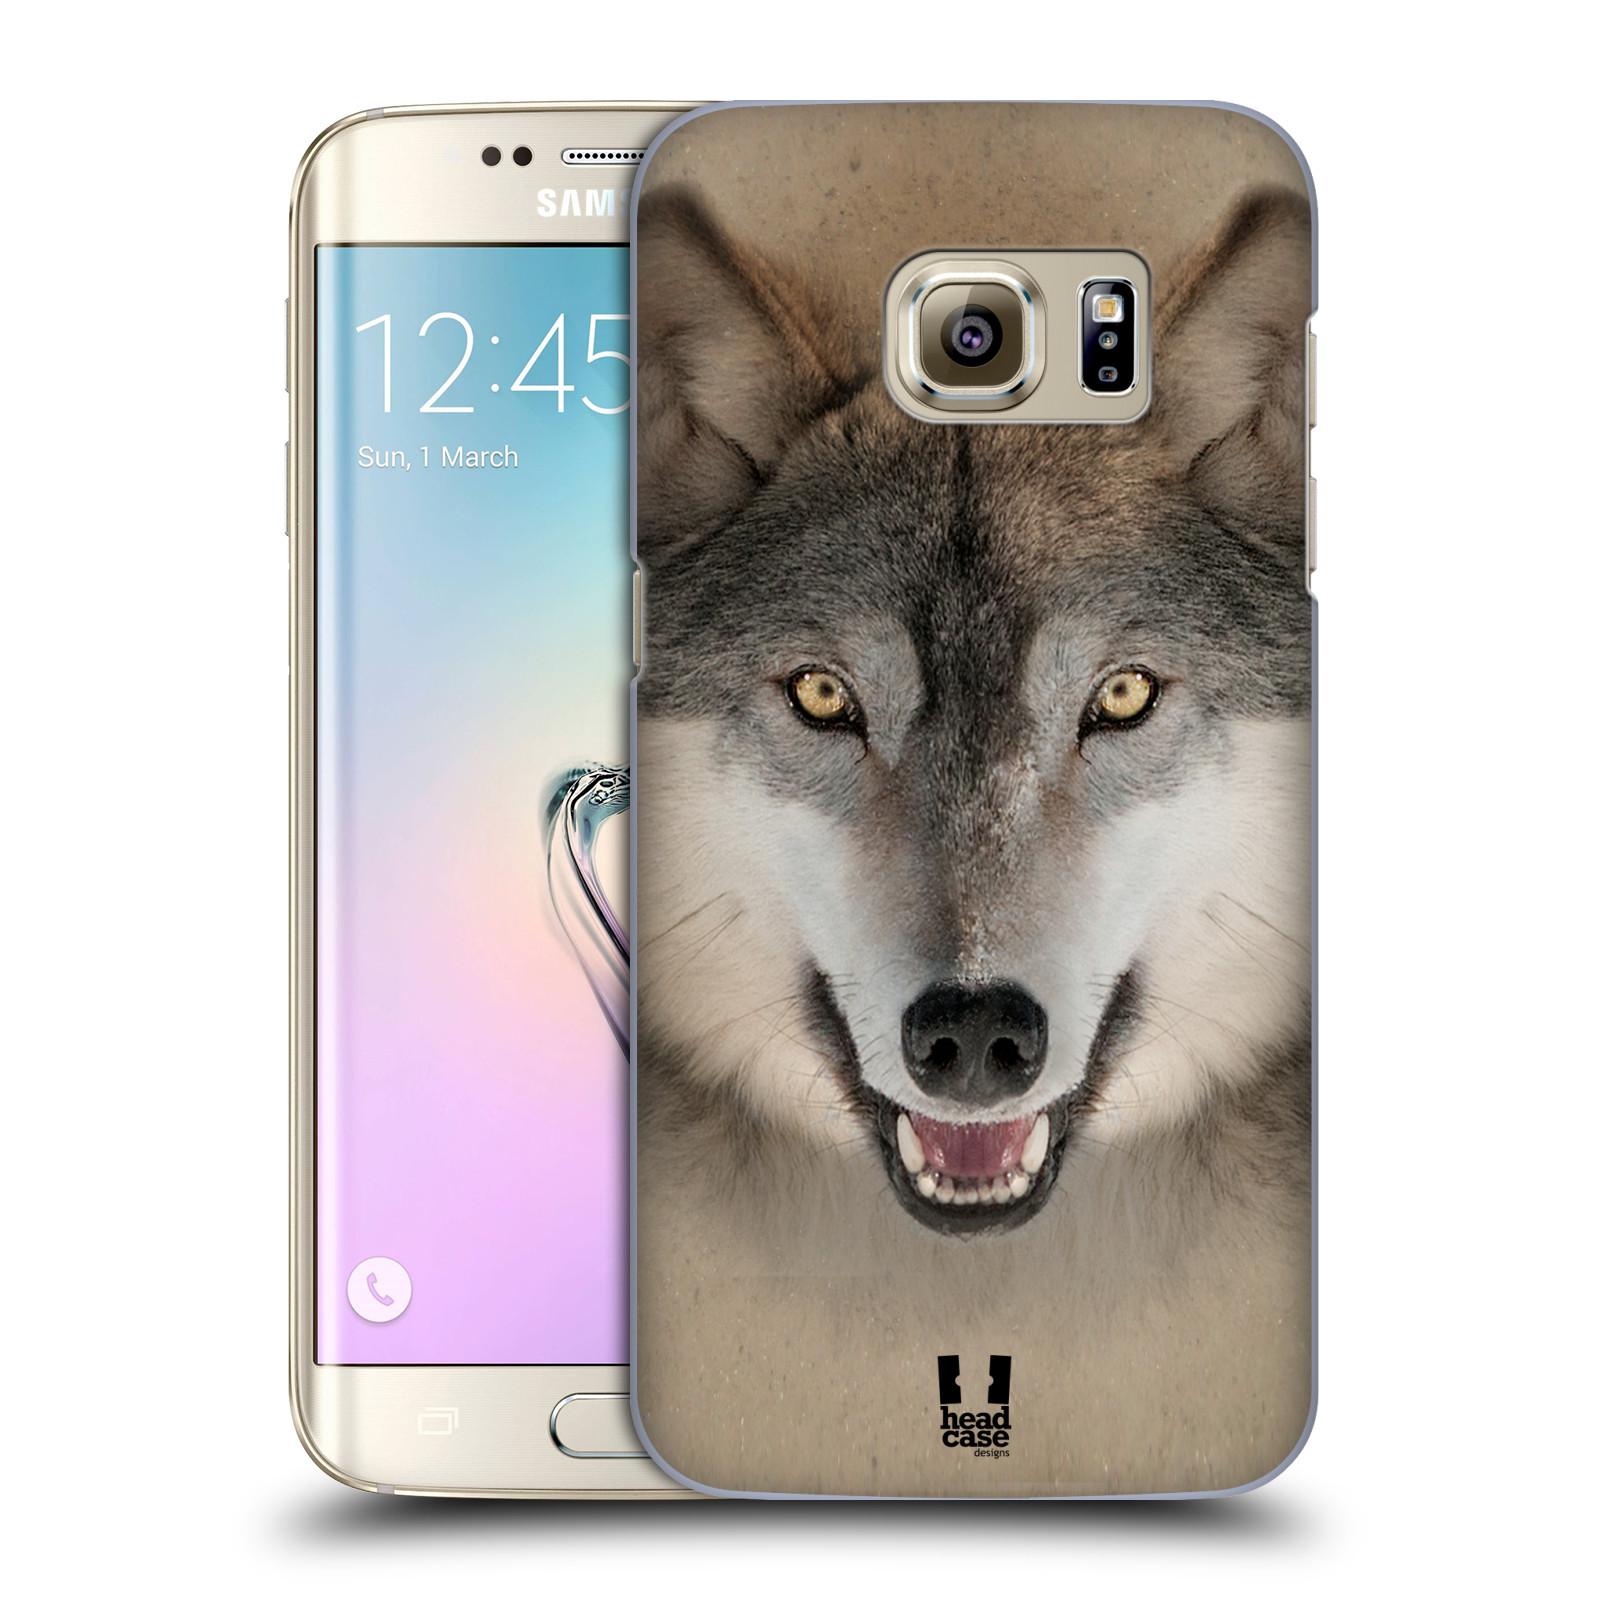 HEAD CASE plastový obal na mobil SAMSUNG GALAXY S7 EDGE vzor Zvířecí tváře 2 vlk šedý